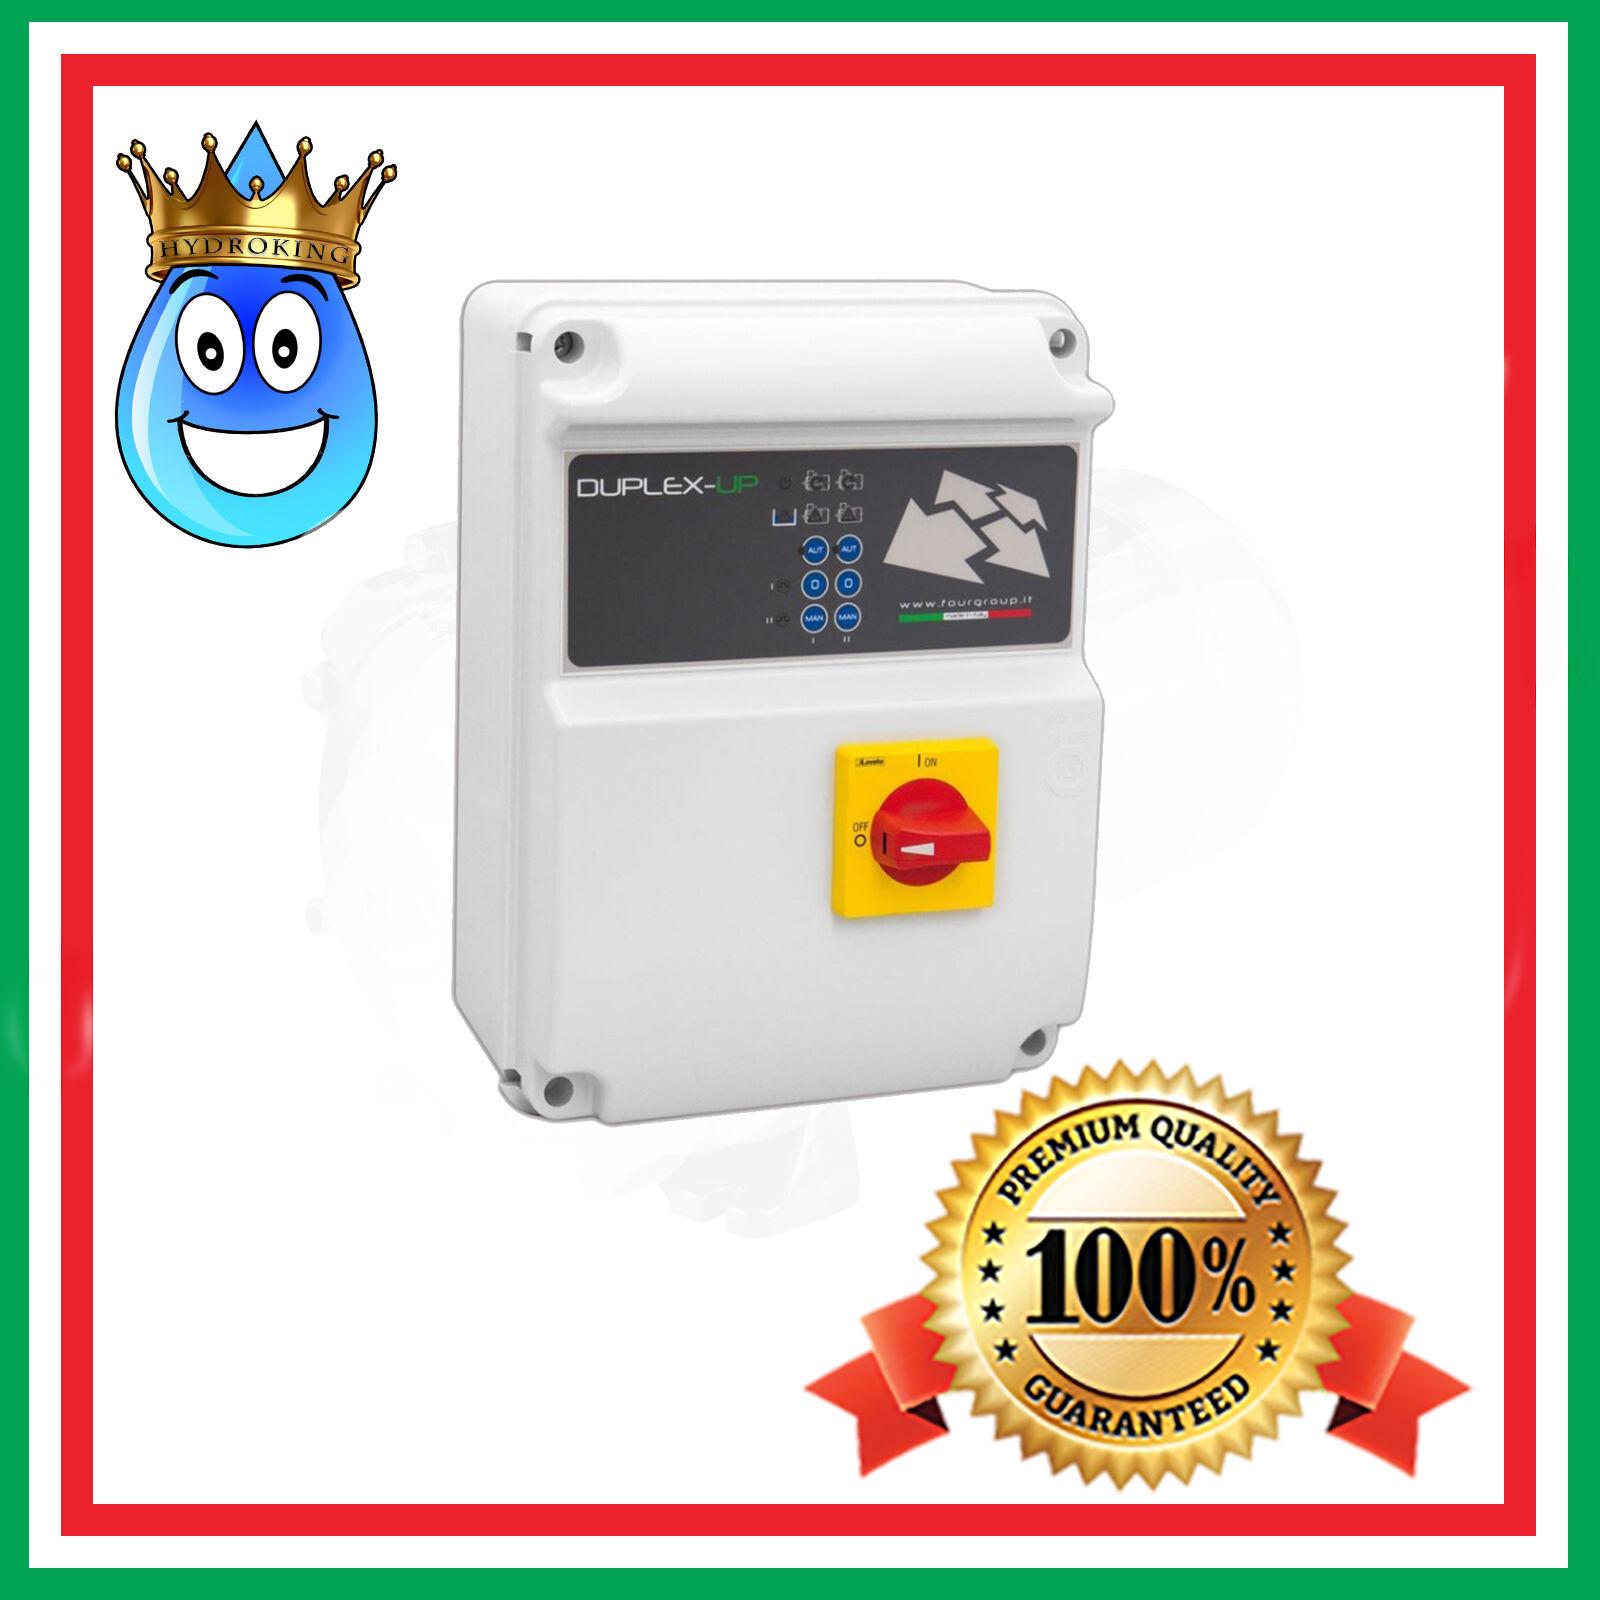 QUADRO ELETTRONICO  FOURGROUP DUPLEX-UP t/10  230V 0,55-7,5kW